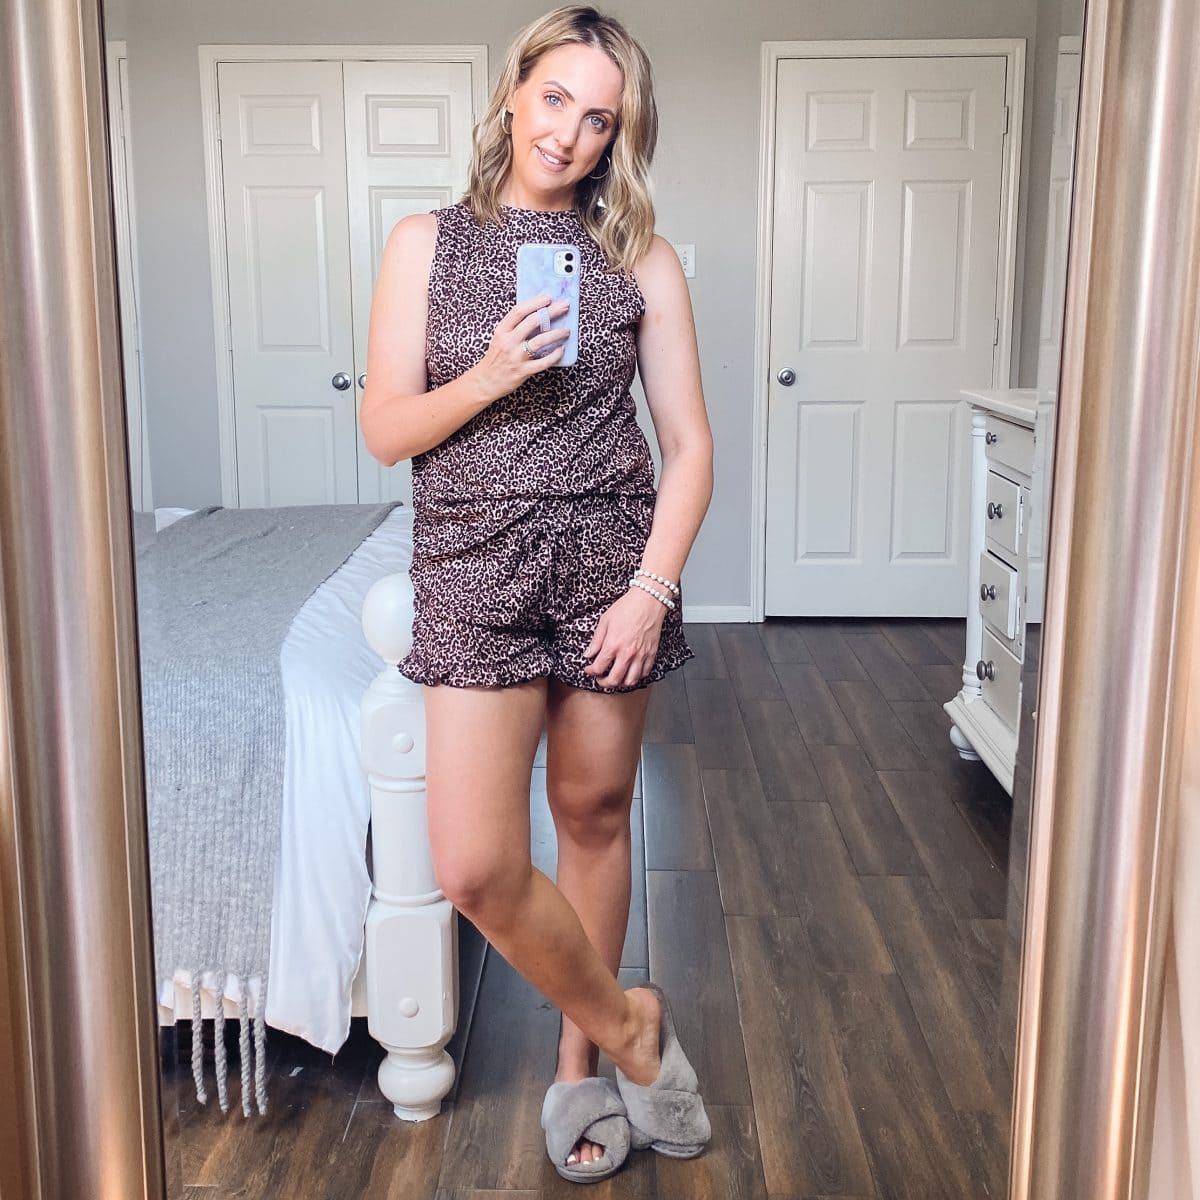 Amazon fashion - comfy cozy leopard print pajamas from Amazon